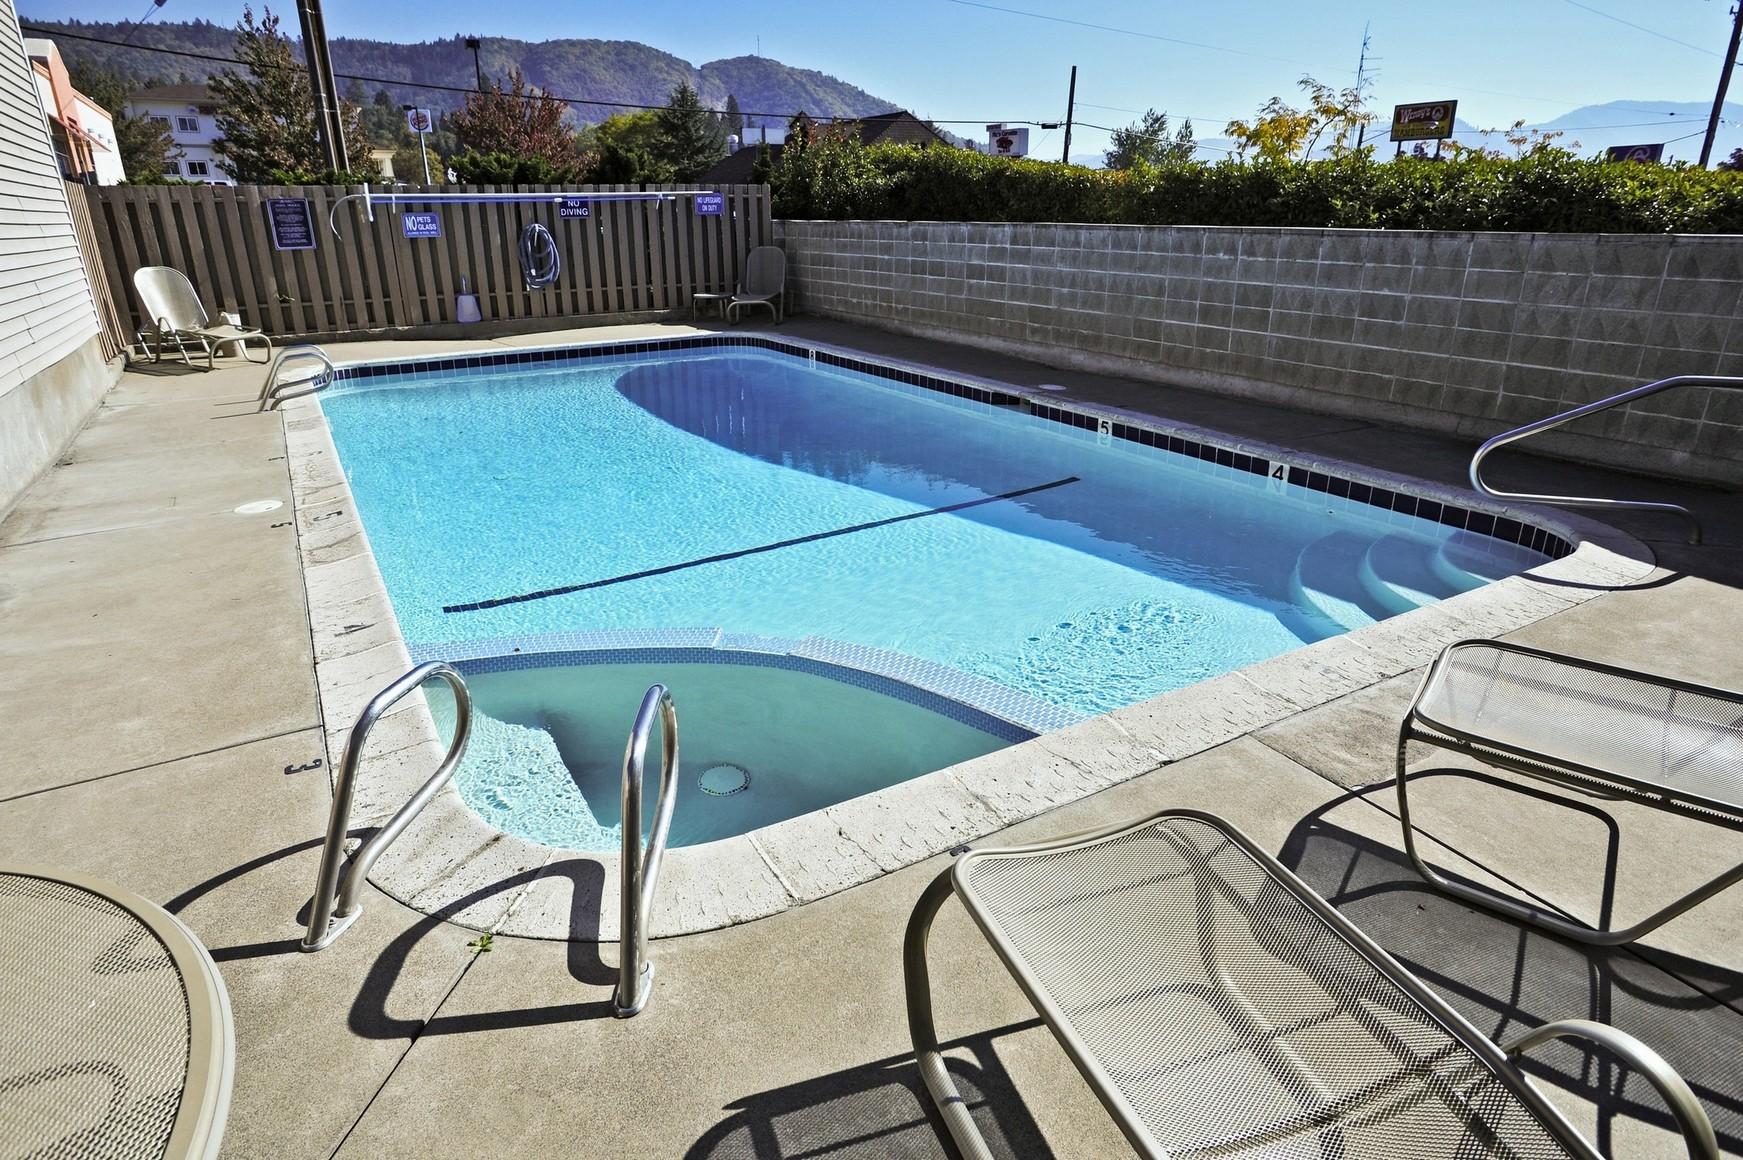 shilo inns suites hotels grants pass oregon. Black Bedroom Furniture Sets. Home Design Ideas